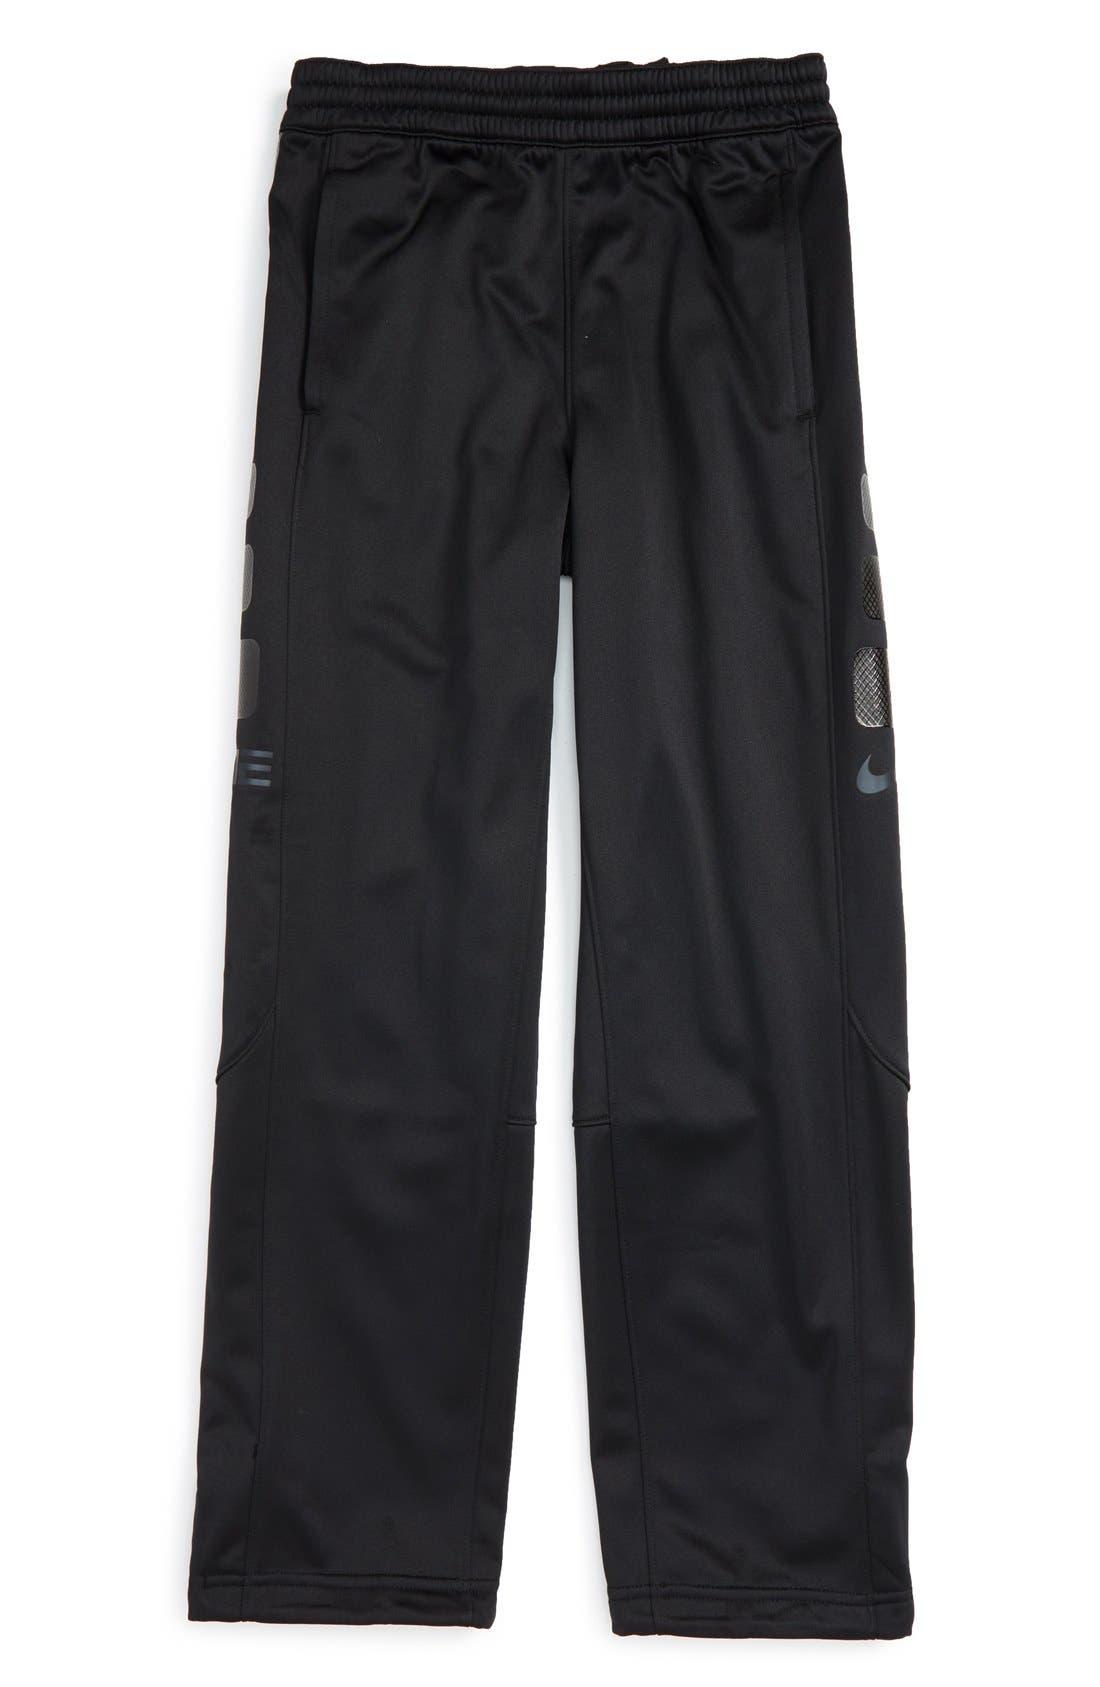 Alternate Image 1 Selected - Nike 'Elite' Therma-FIT Pants (Little Boys & Big Boys)